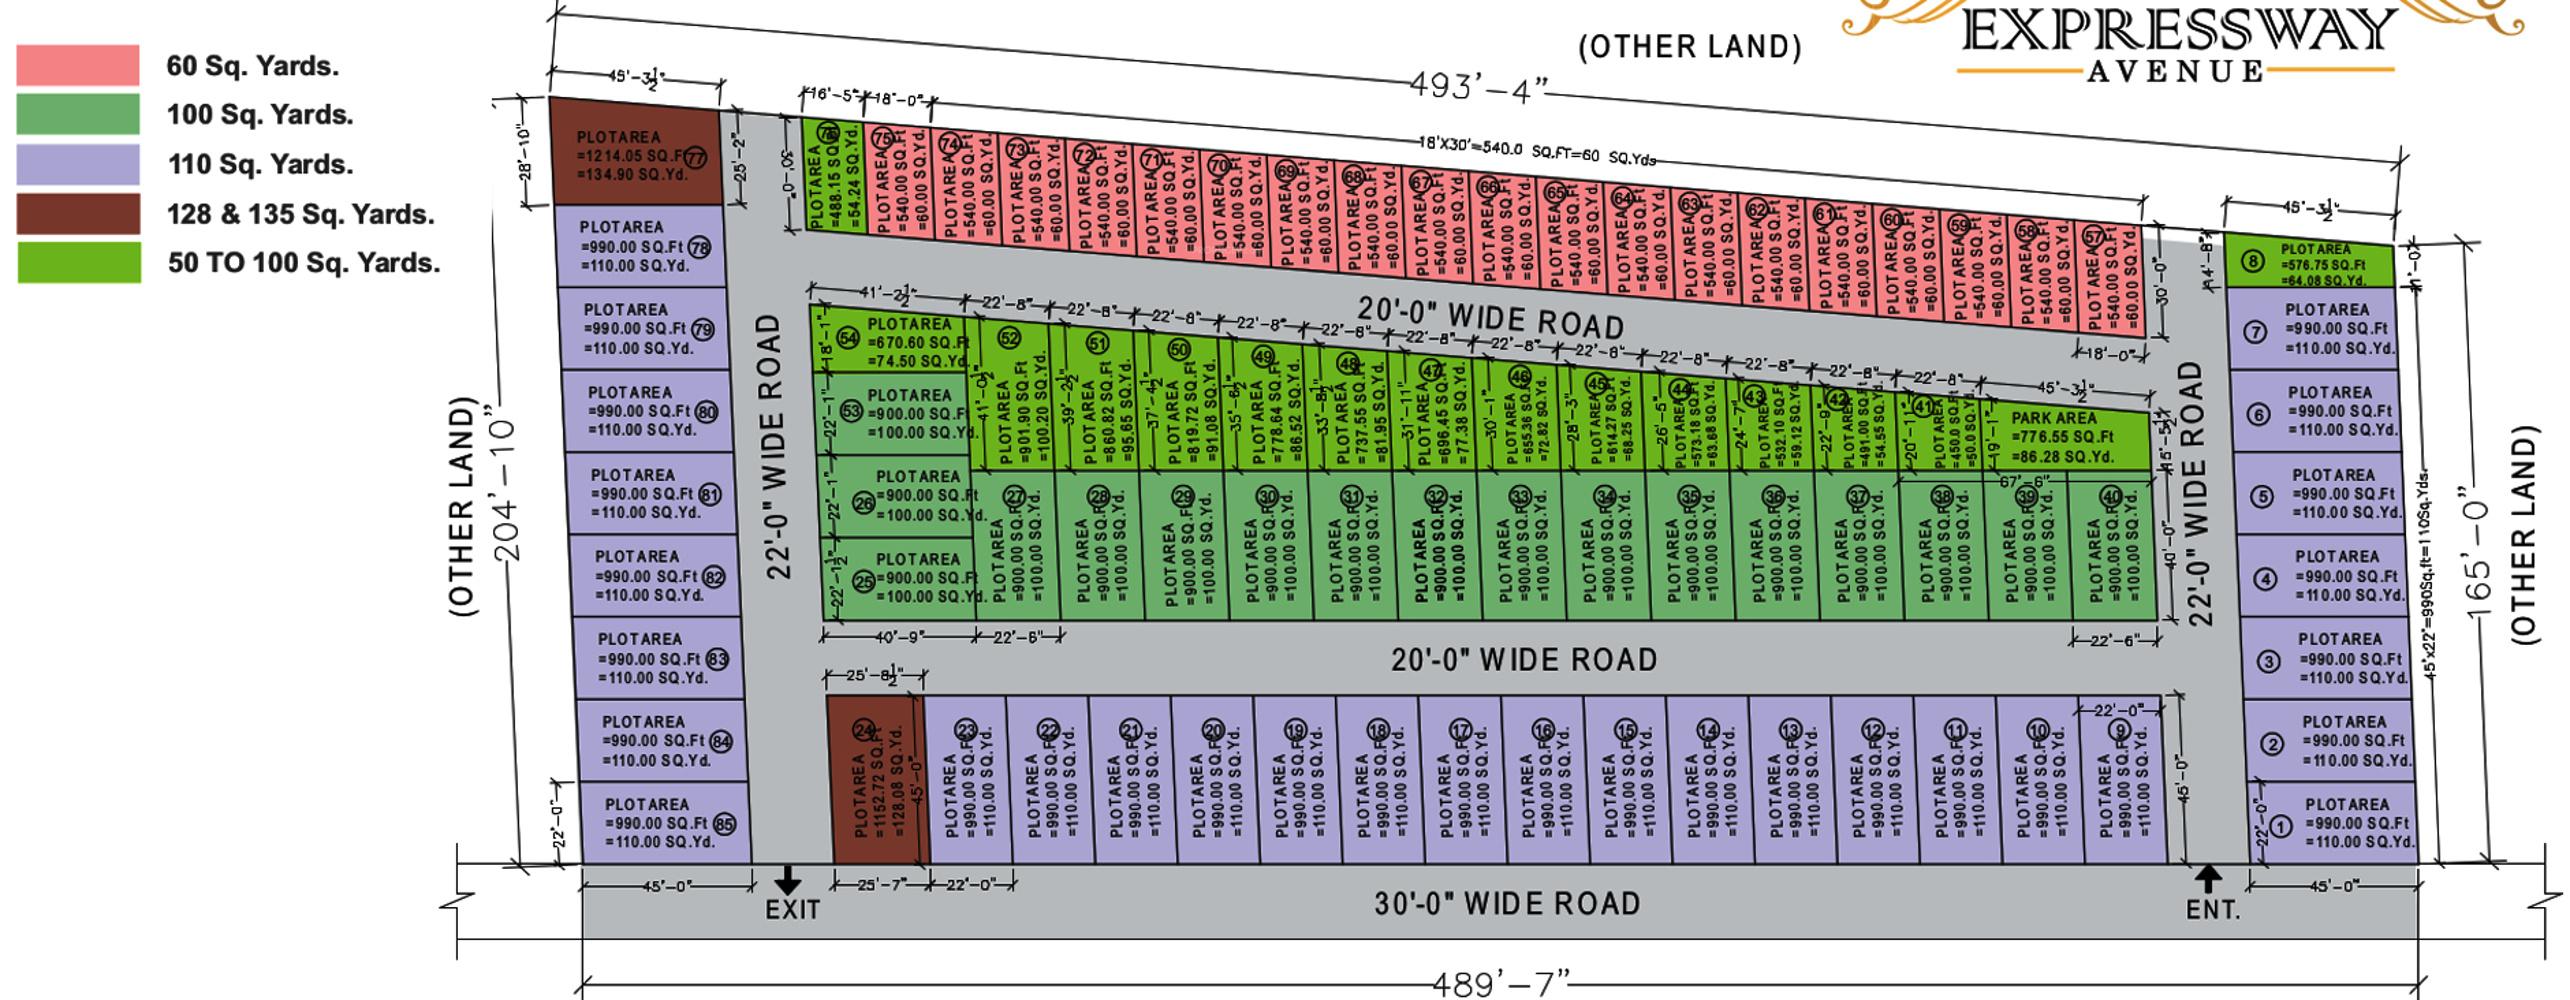 Ns Expressway Avenue In Sector 17b Yamuna Expressway